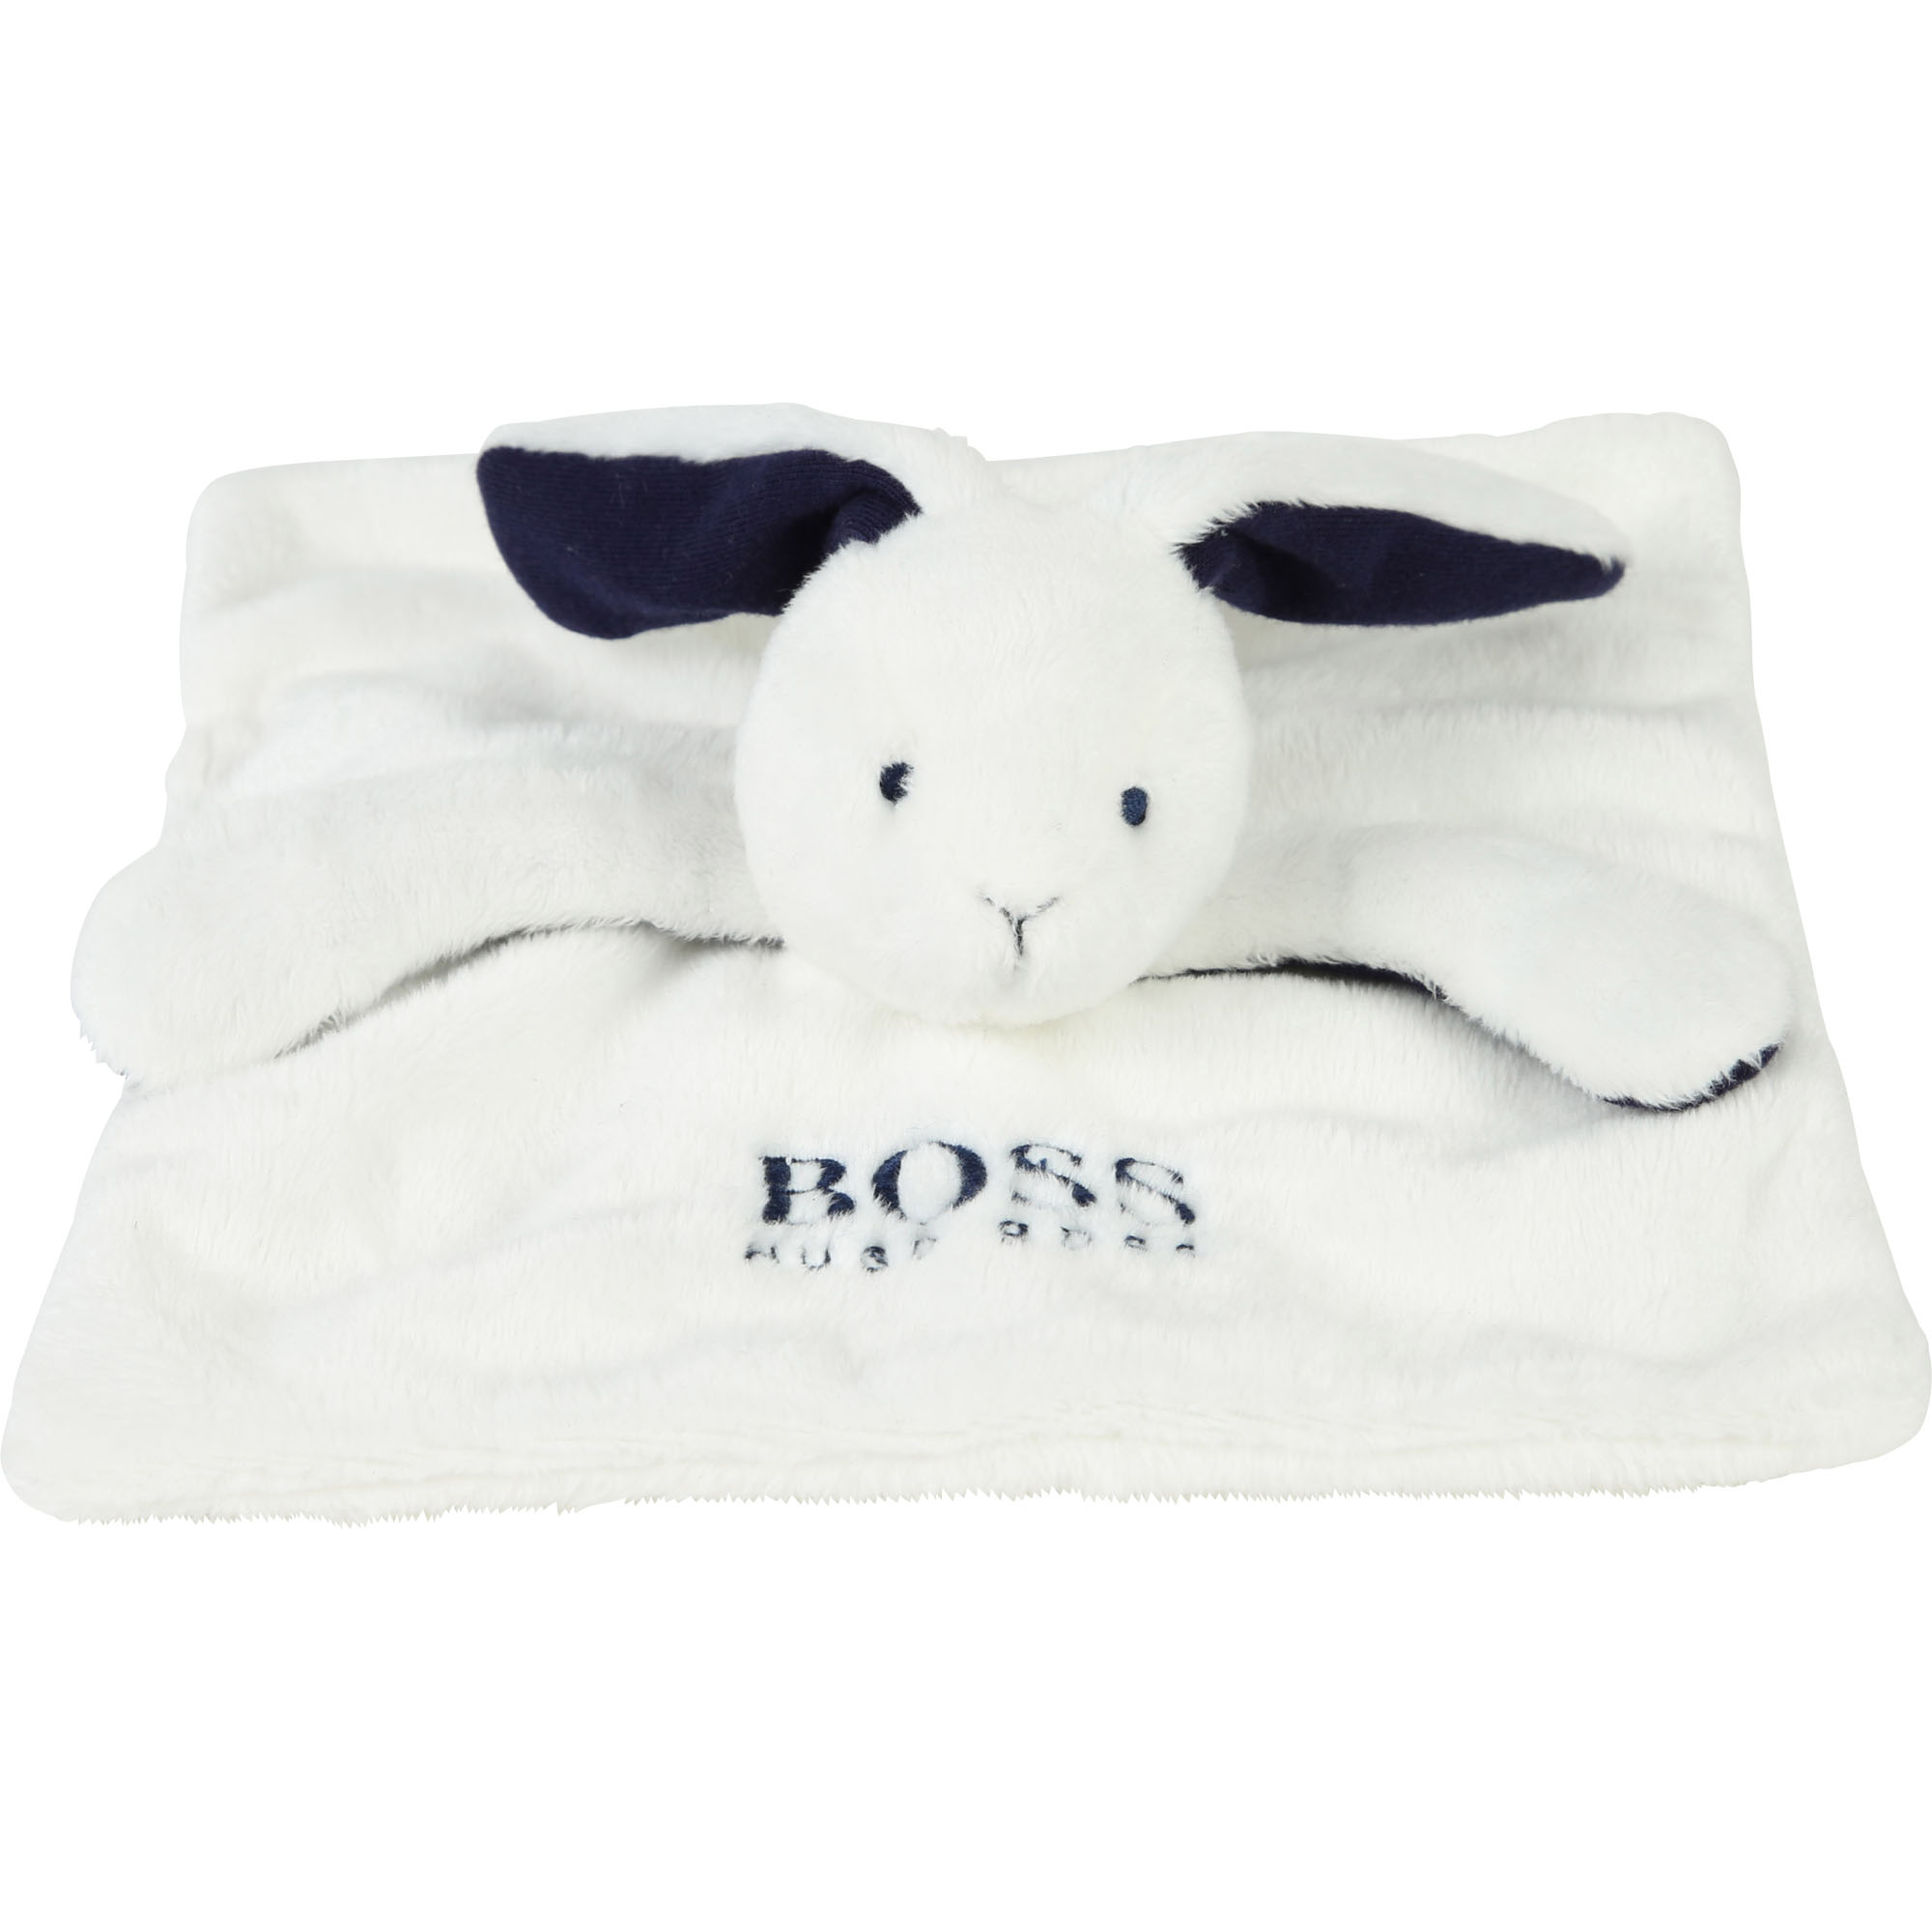 Hugo Boss baby bunny cuddly cloth - white